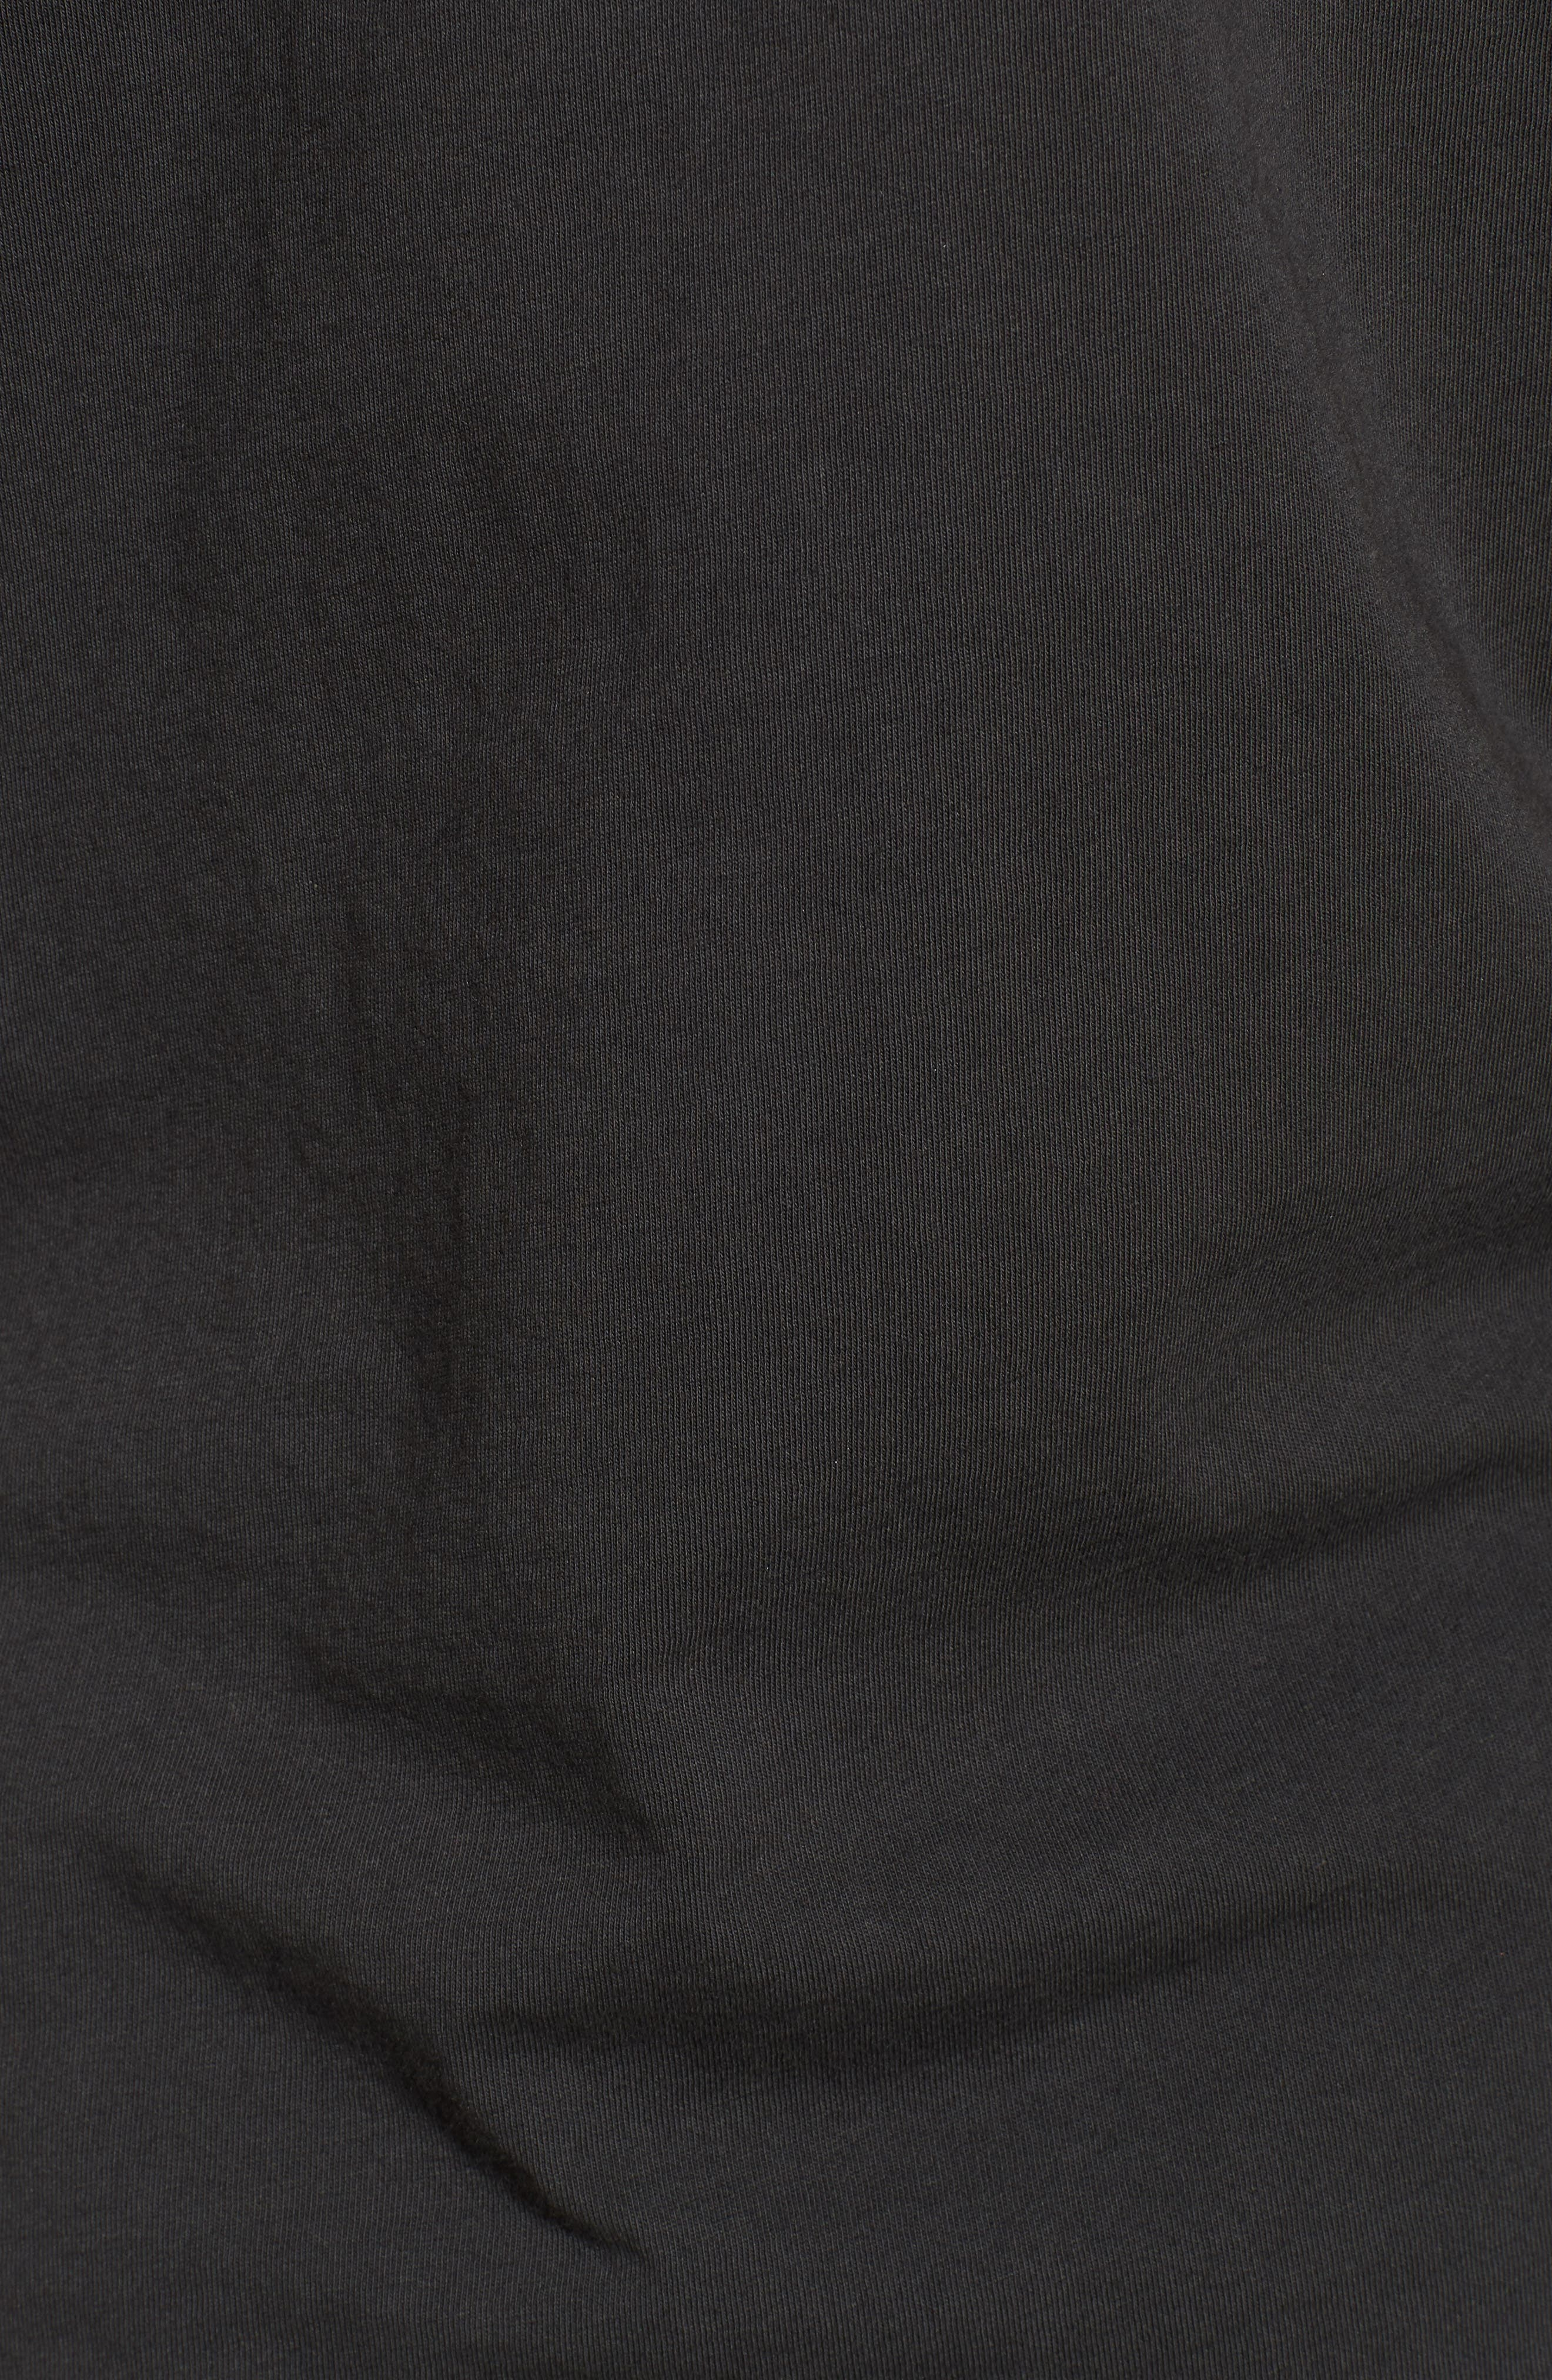 Only the Good Crewneck T-Shirt,                             Alternate thumbnail 5, color,                             Dusty Black